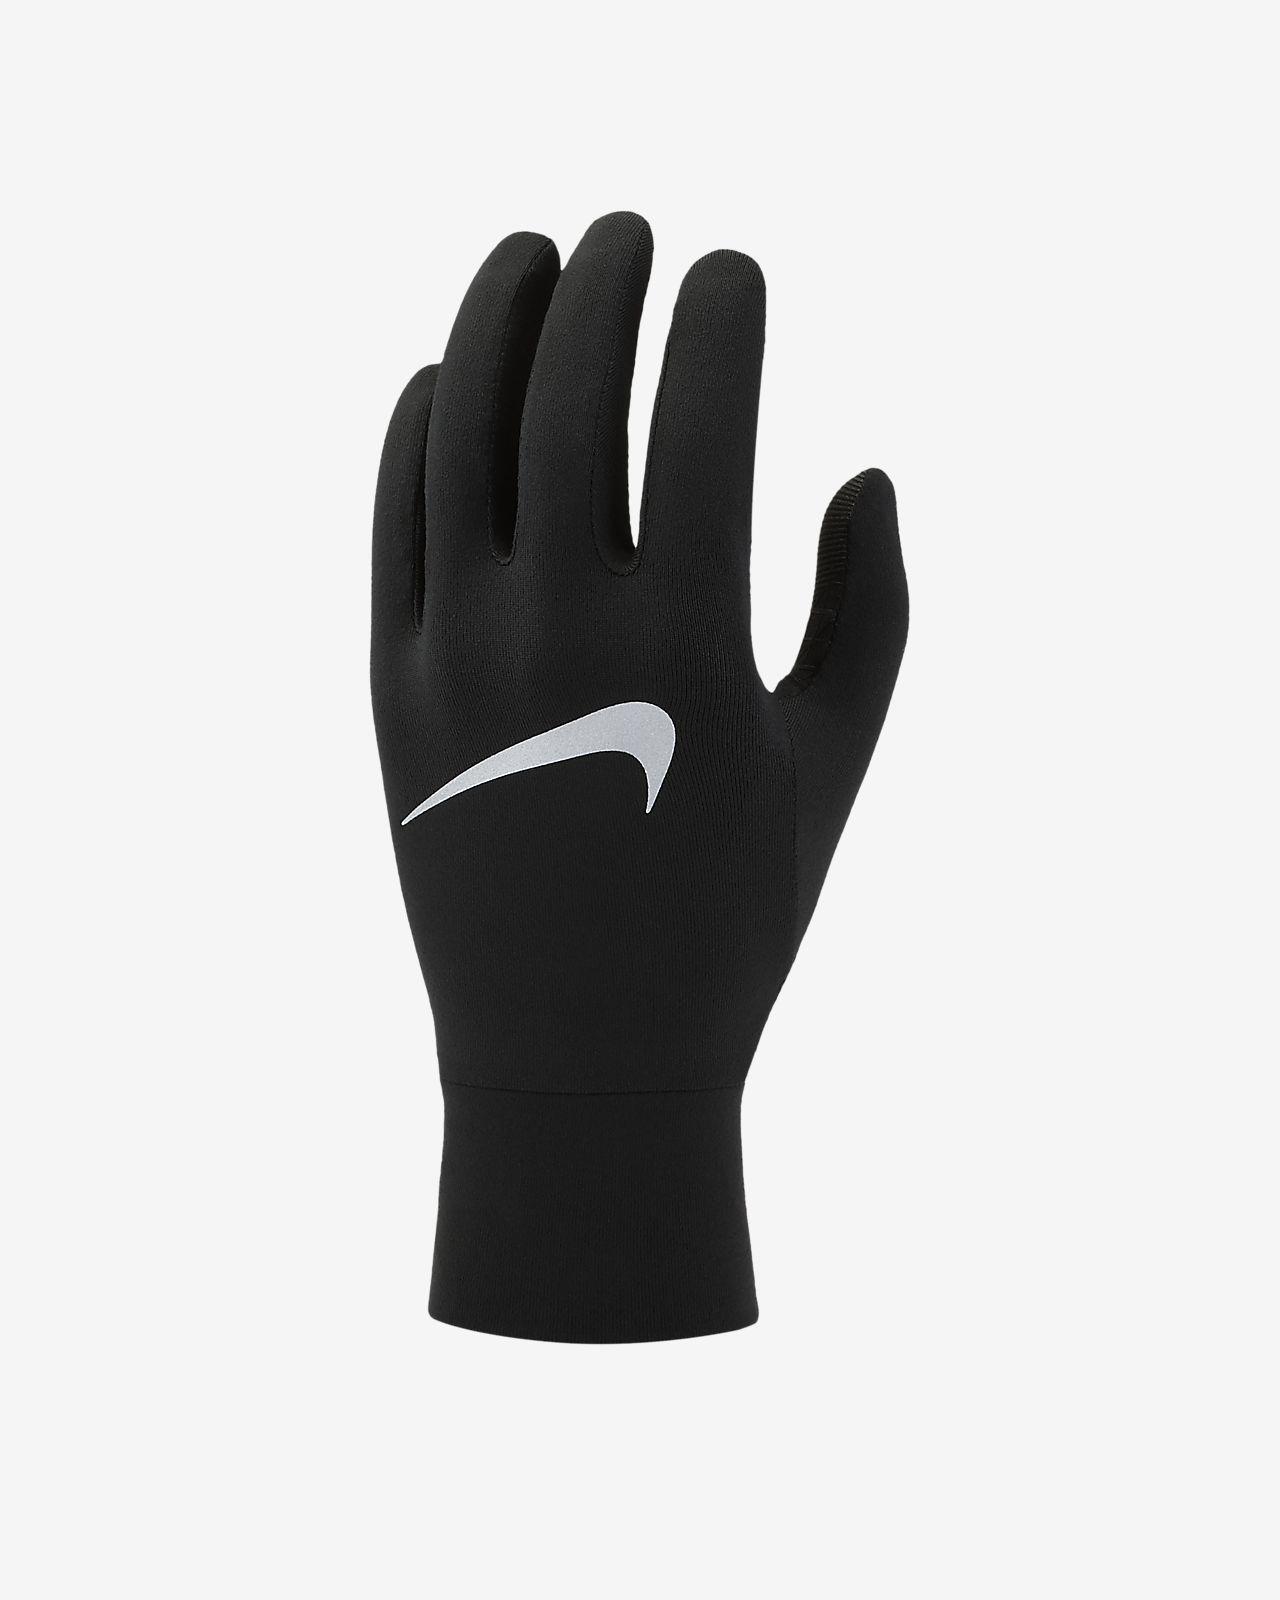 33839d3f88a Nike Dri-FIT Hardloophandschoenen voor dames. Nike.com NL